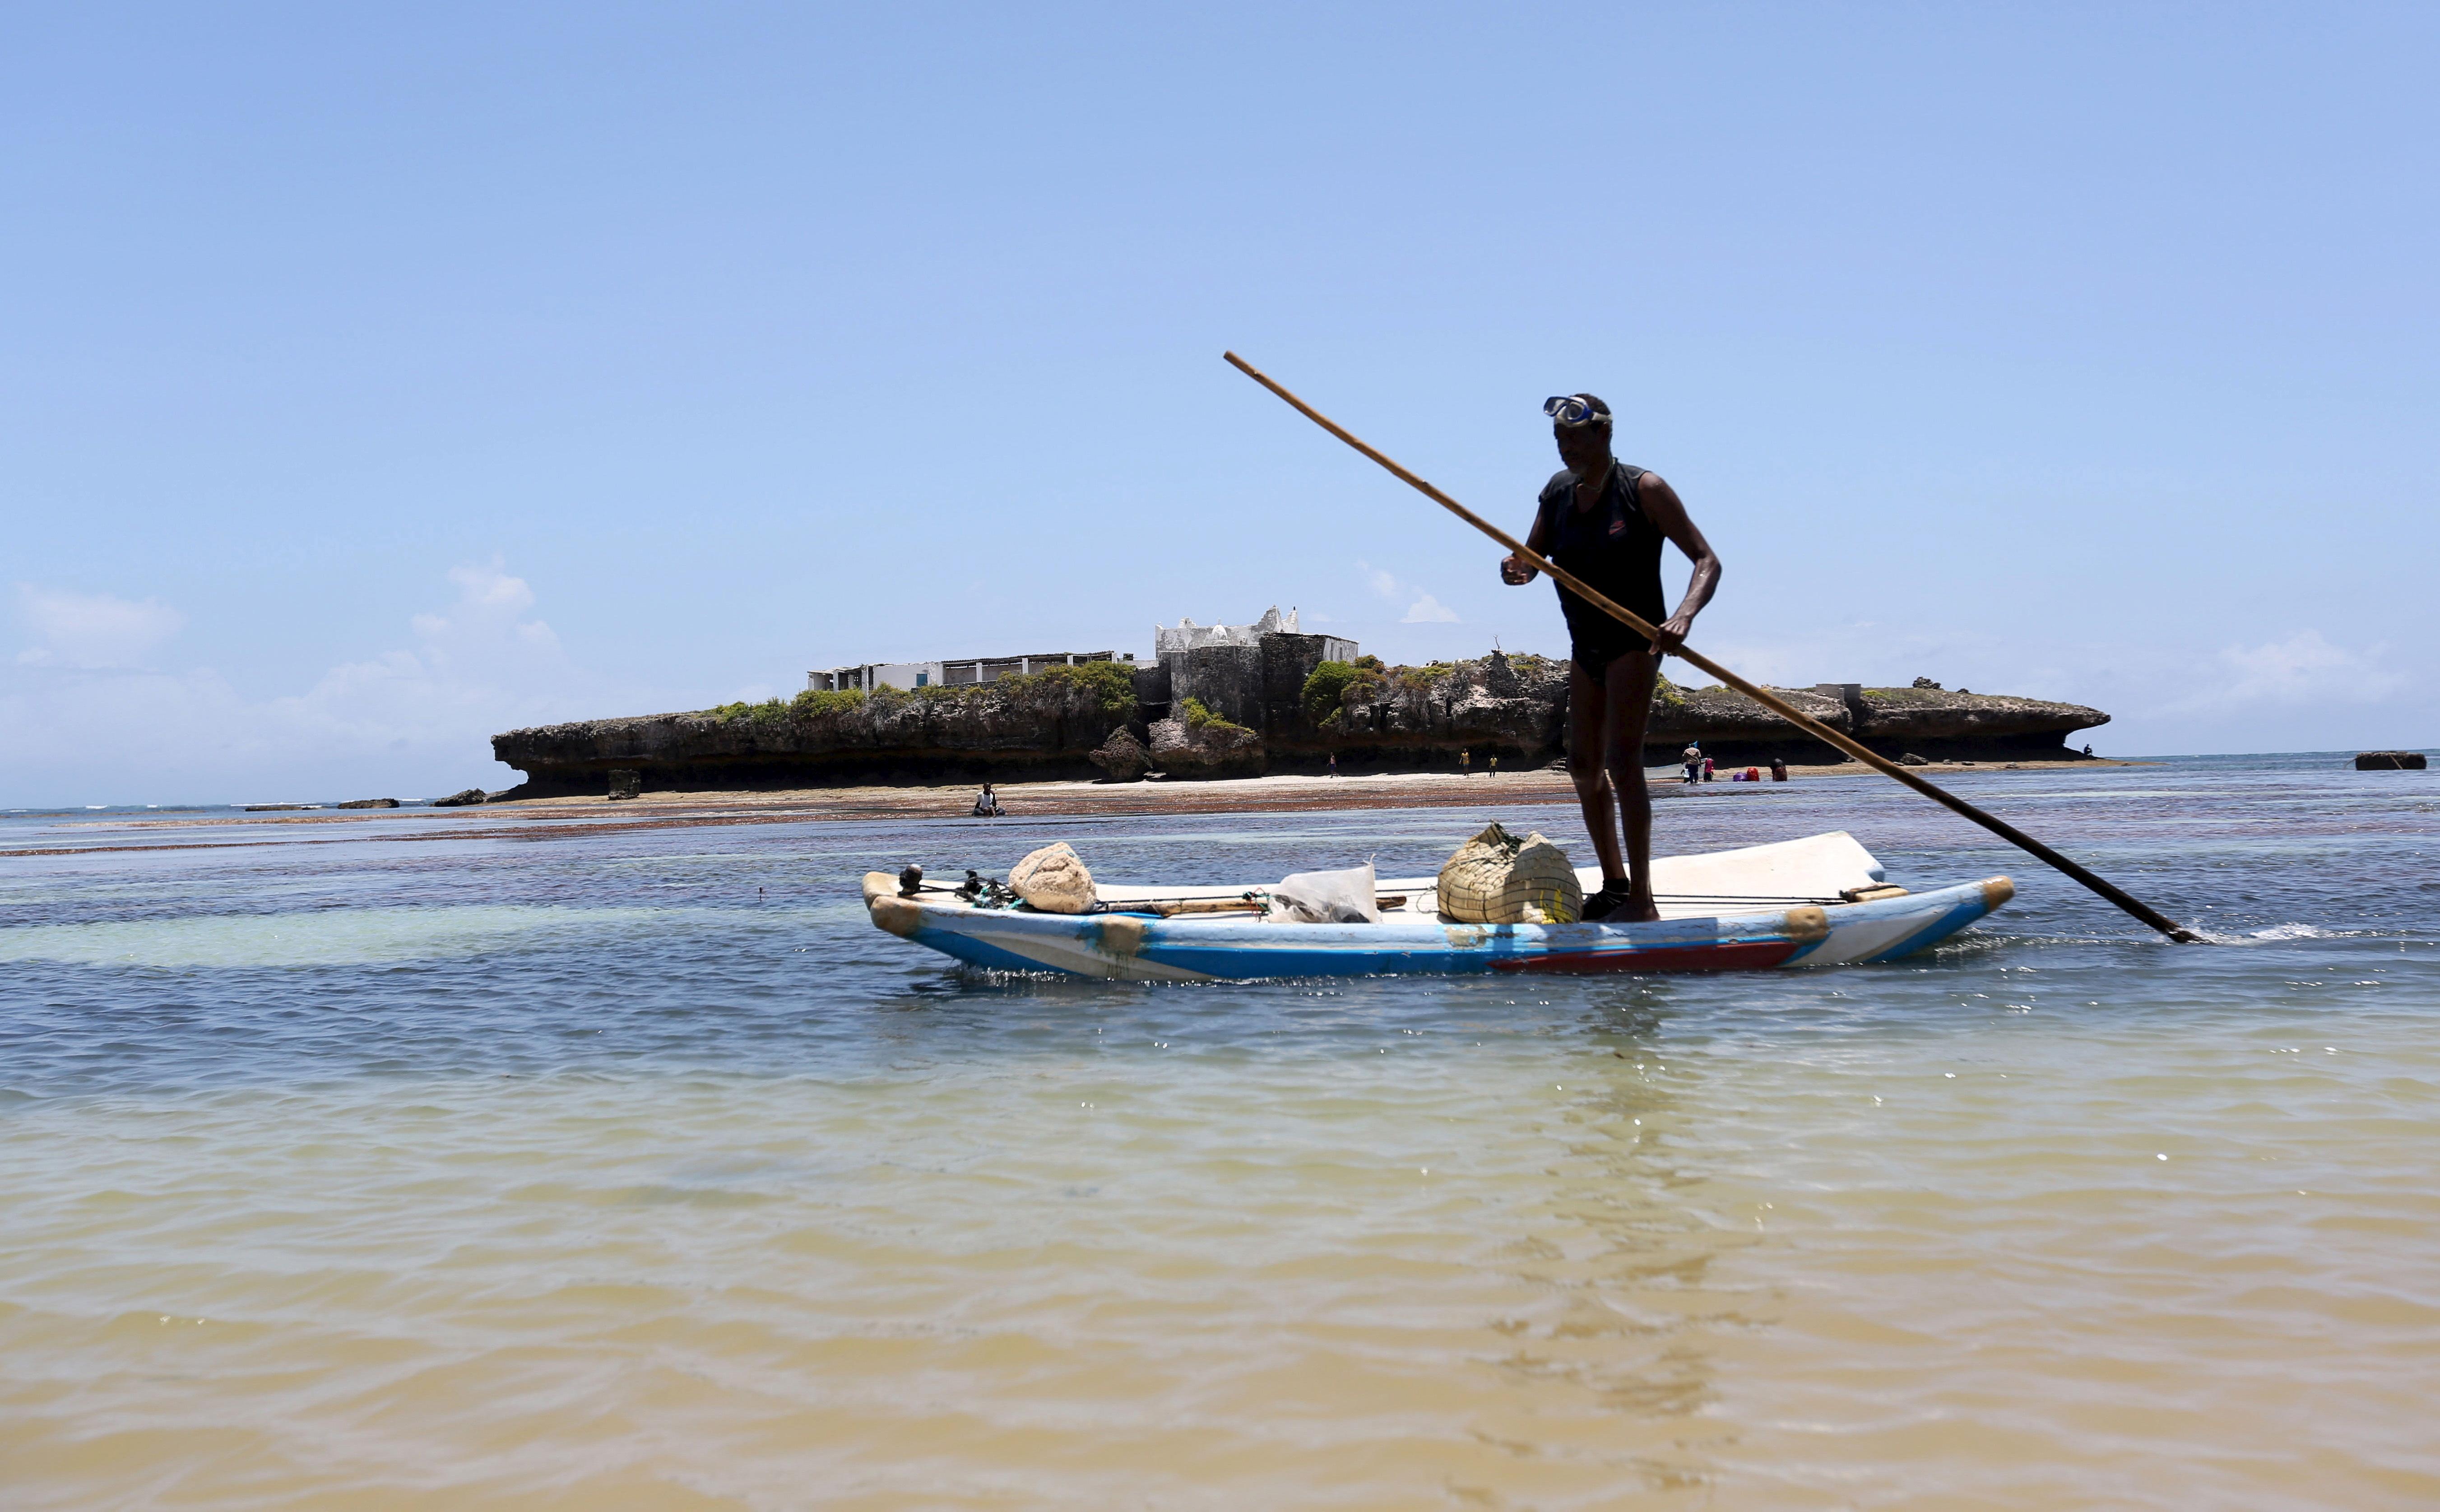 A fisherman paddles his boat in the Indian Ocean next to Jazeera beach near Somalia's capital Mogadishu, October 2, 2015. REUTERS/Feisal Omar